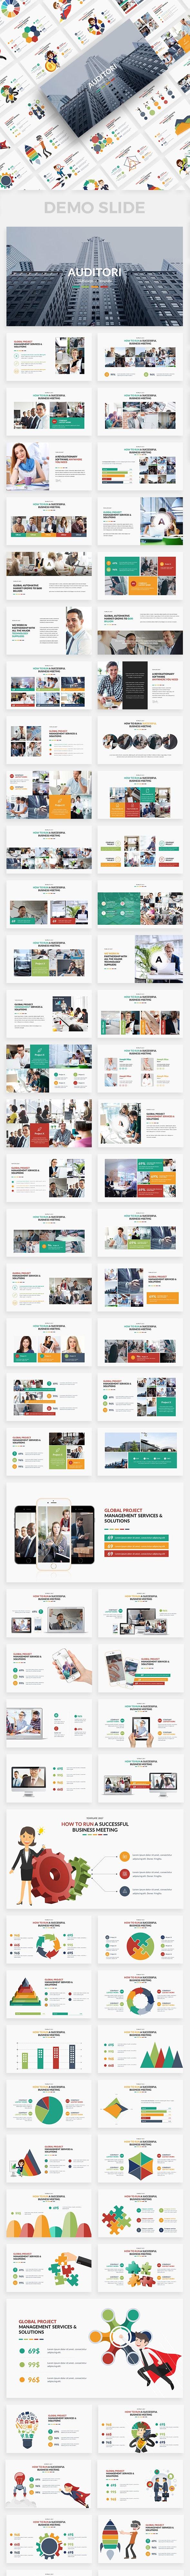 Auditori Project Multipurpose Google Slide Template - Google Slides Presentation Templates